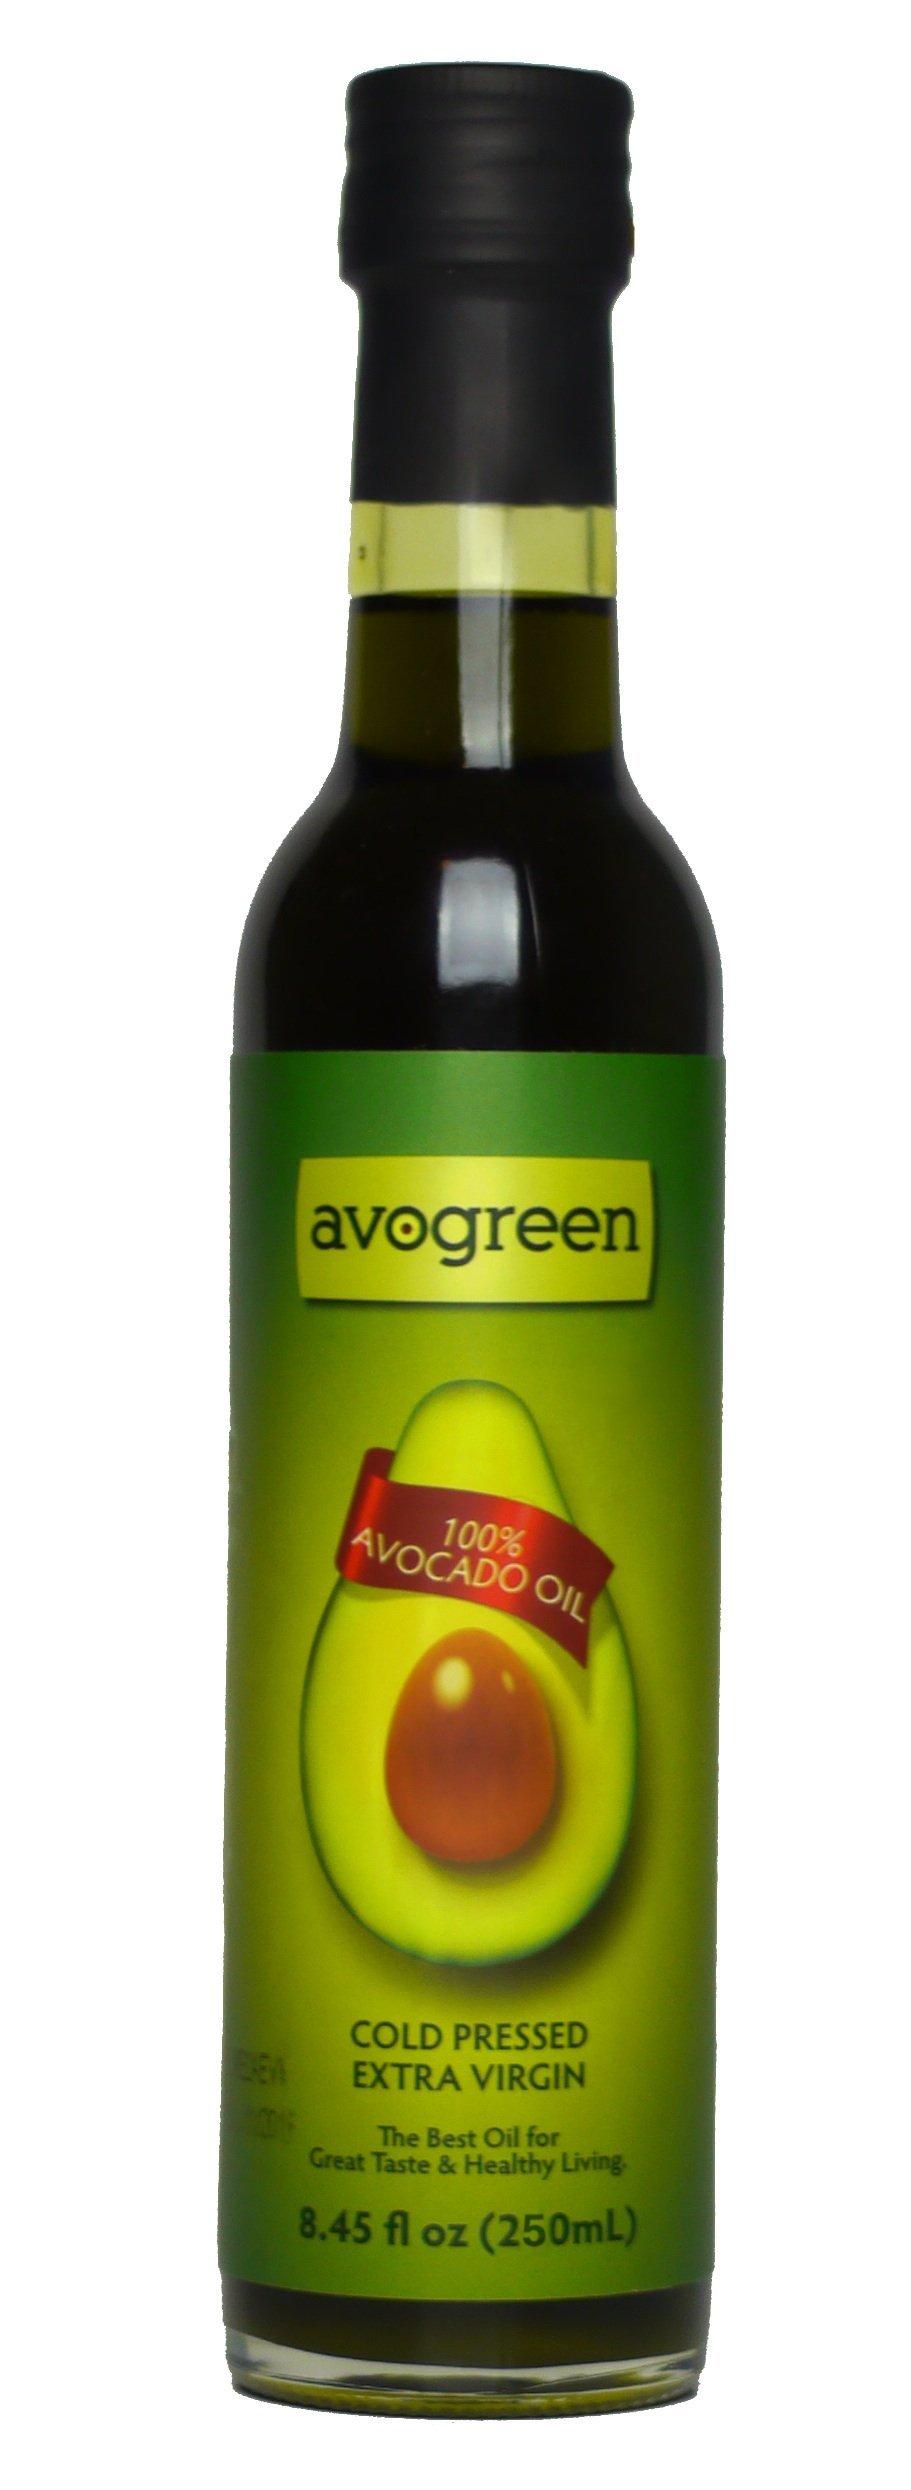 250mL Avogreen Extra Virgin Avocado Oil